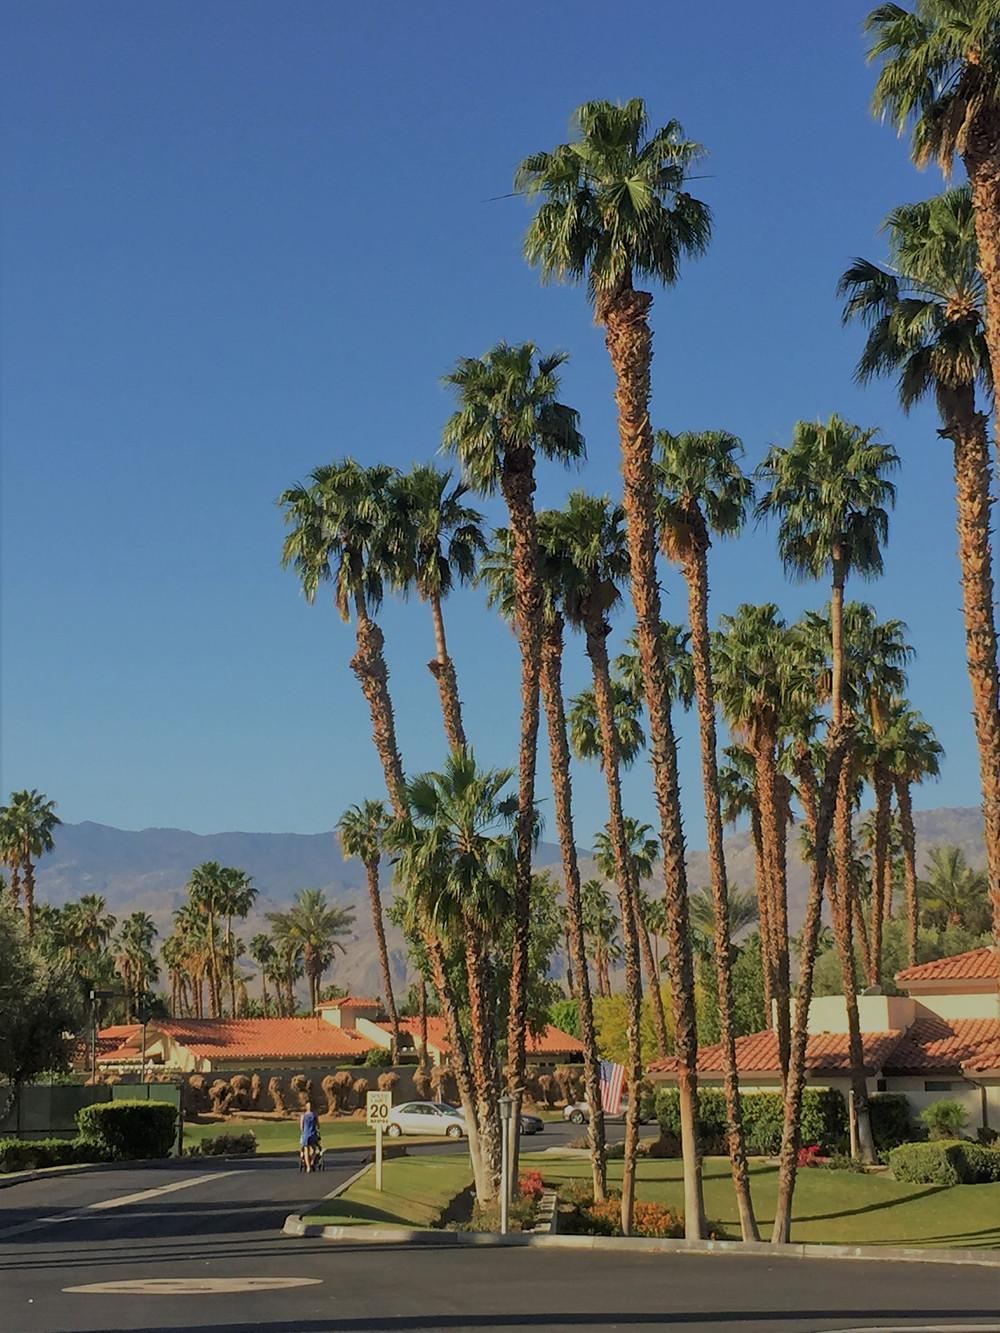 Park Palms Condo community in Palm Desert